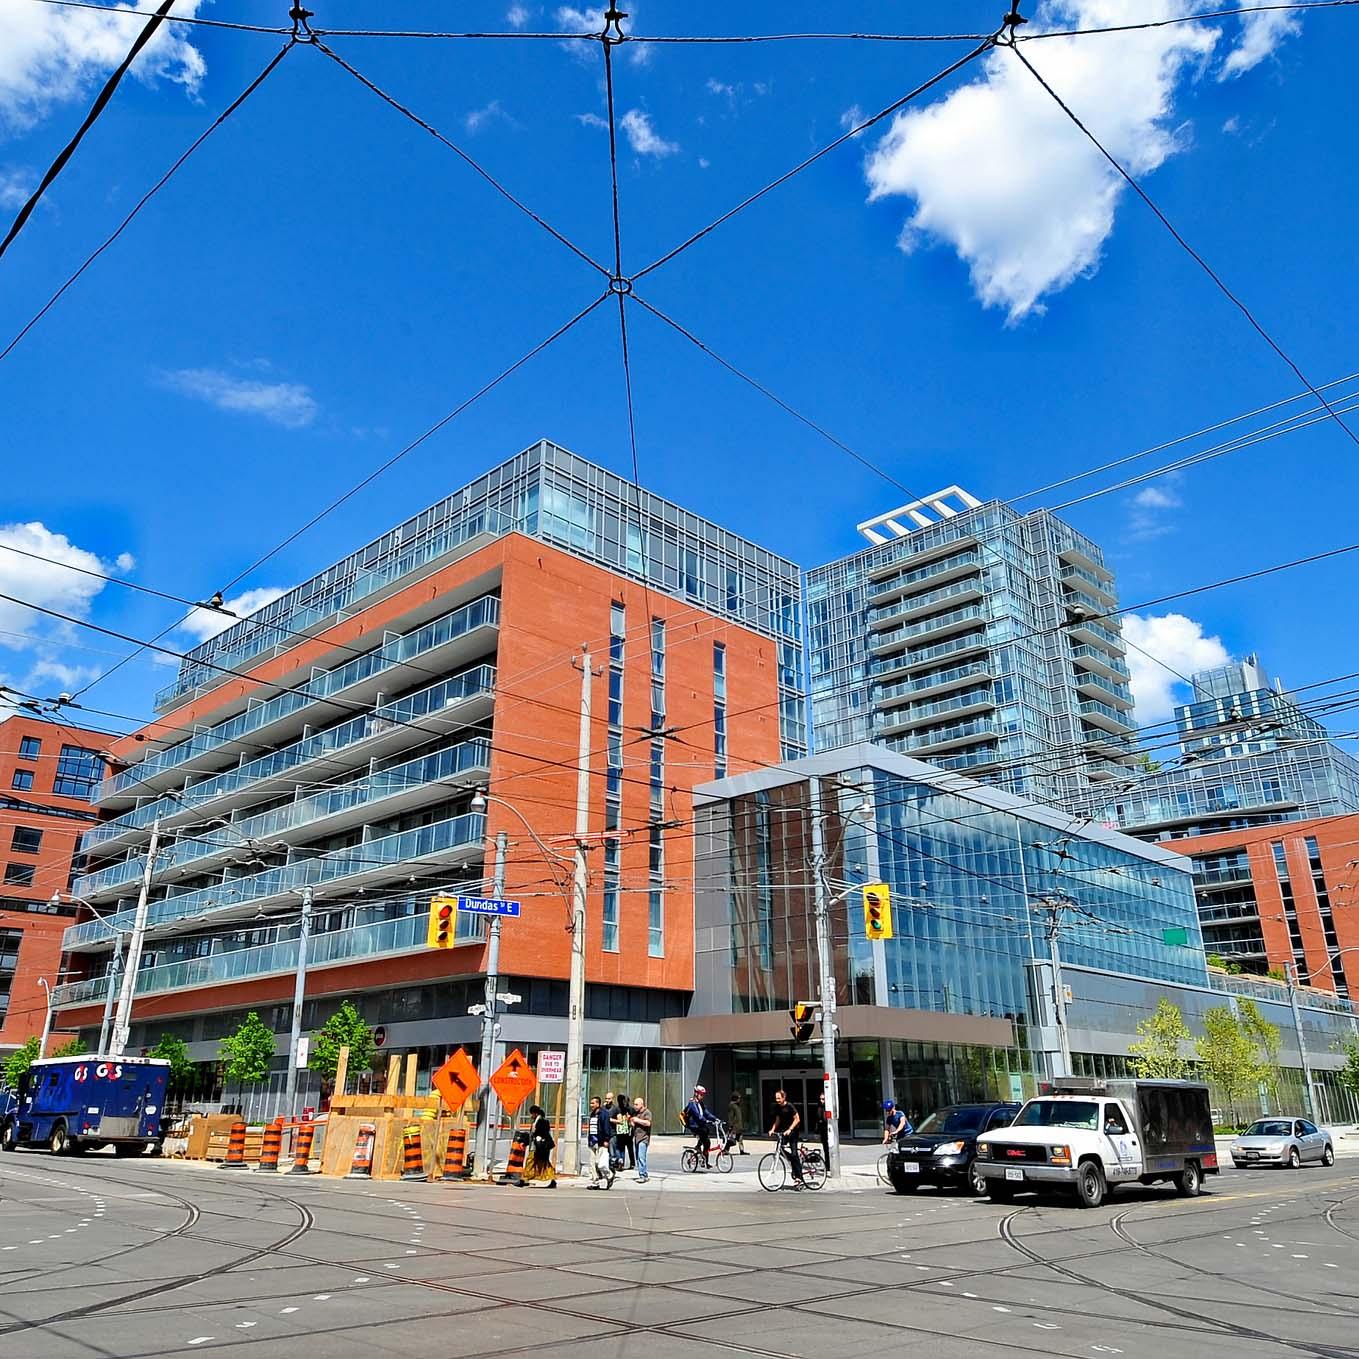 Toronto's Regent Park neighborhood